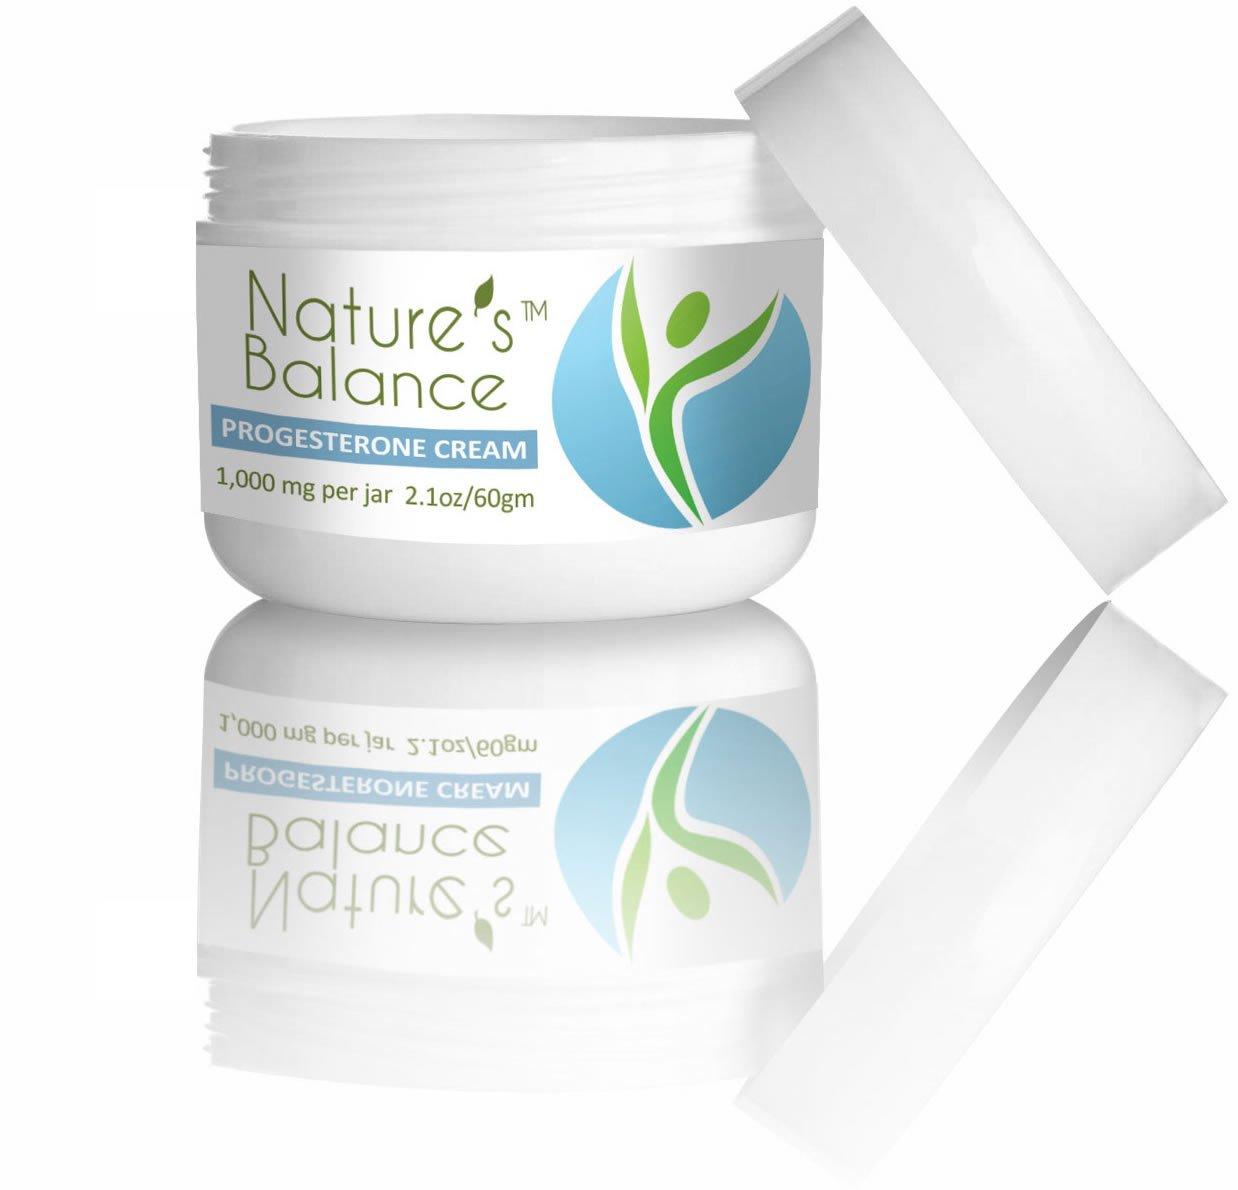 Bio identical Progesterone Cream Natural Ingredients